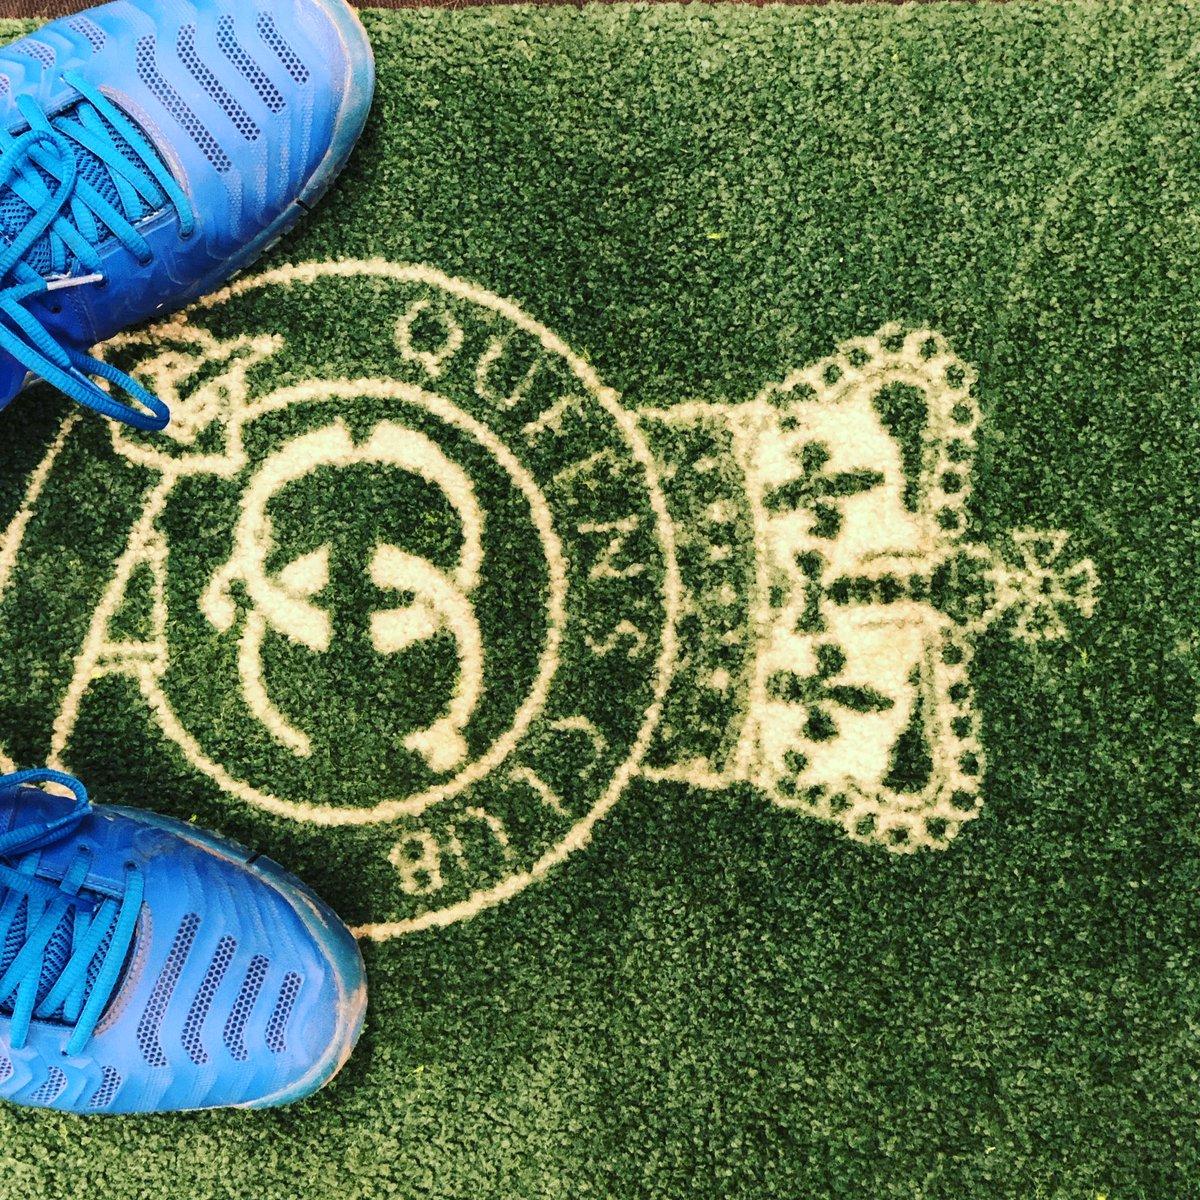 Not on call. No meetings. Tennis Team Practice @TheQueensClub #tennis #queensclub #saturdaysport<br>http://pic.twitter.com/HkkRMPfojd